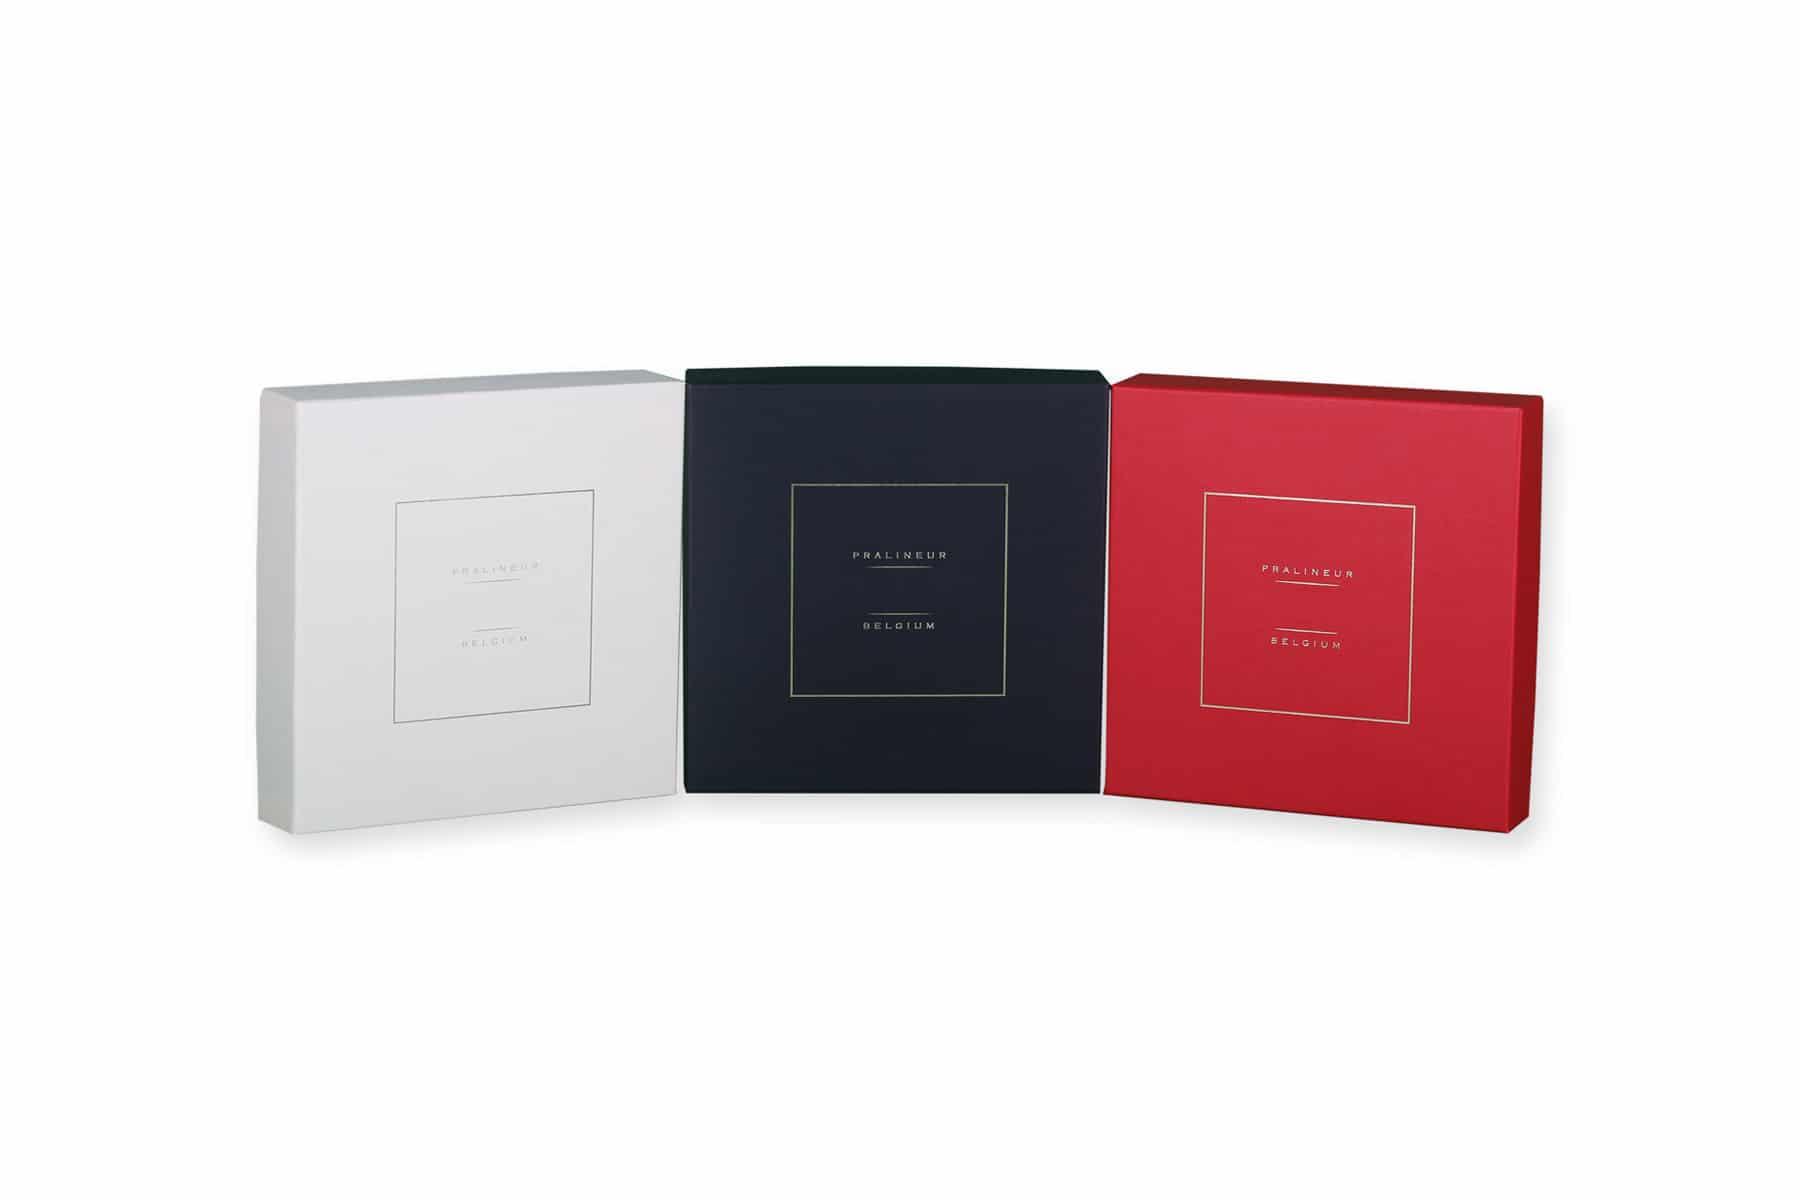 luxe-kartonnen-dozen-5-1800x1200